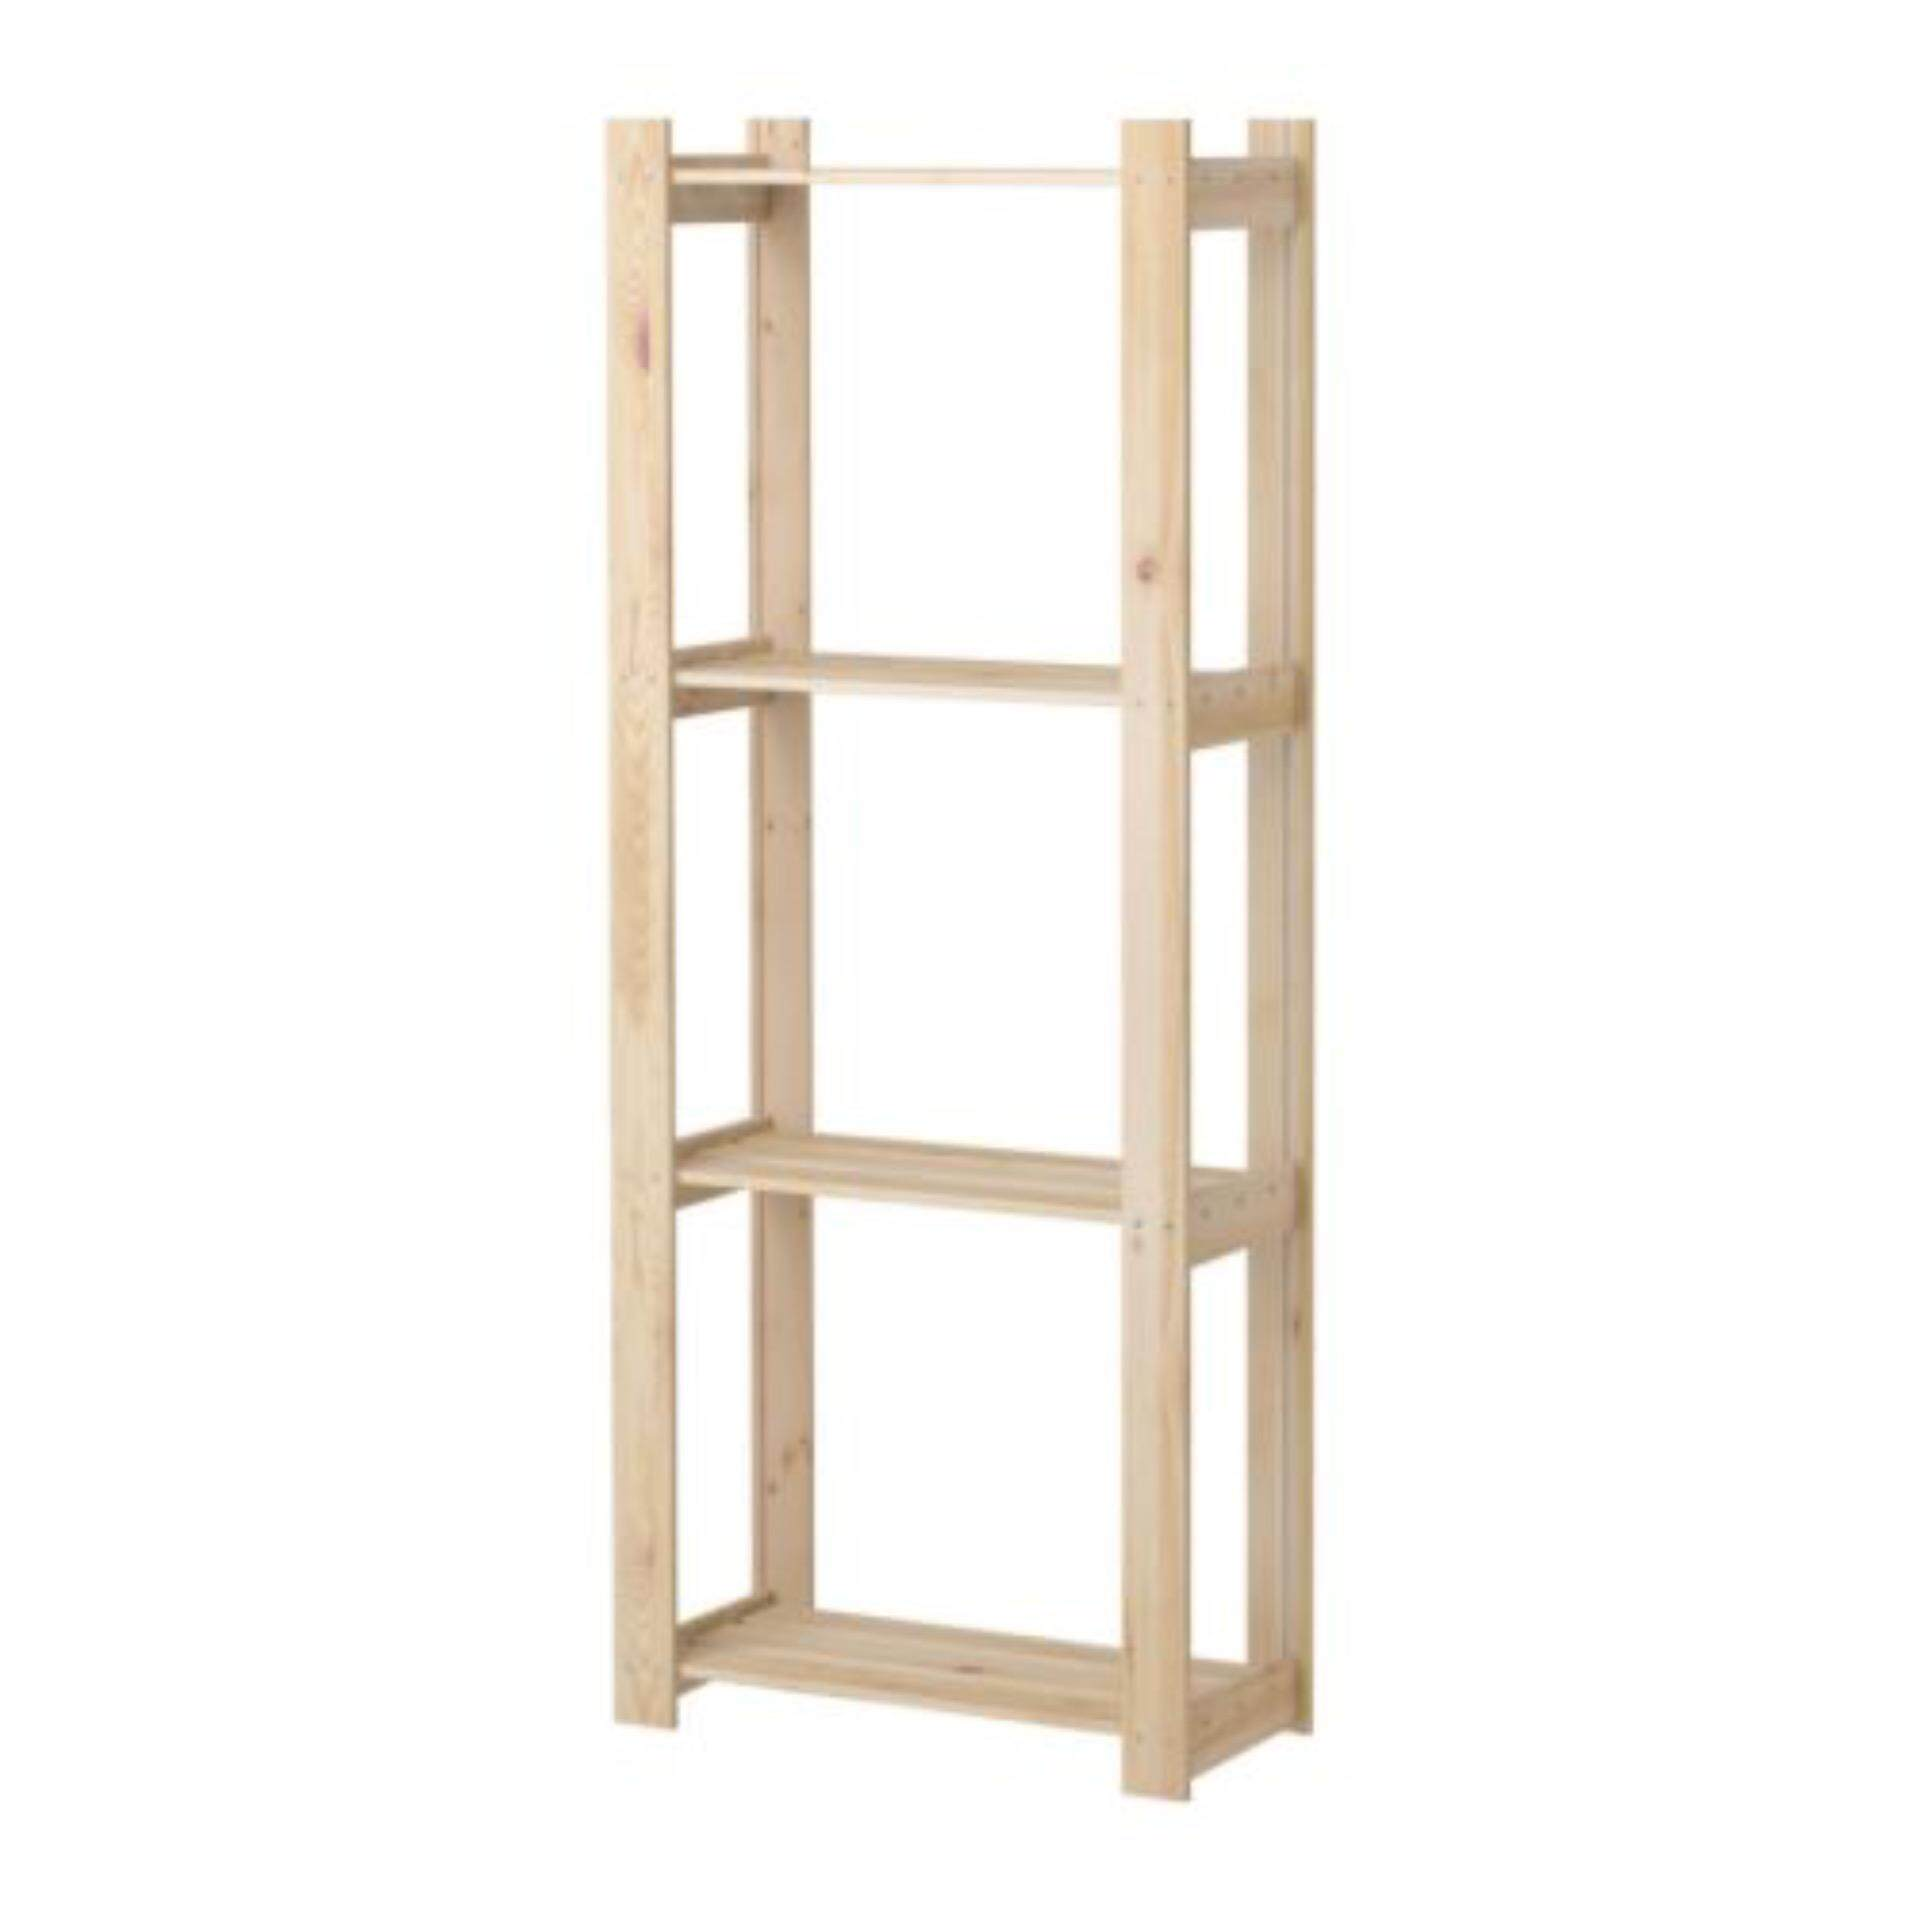 Deco Book Case Book Shelf Book Cabinet Book Rack Multi-Purpo...